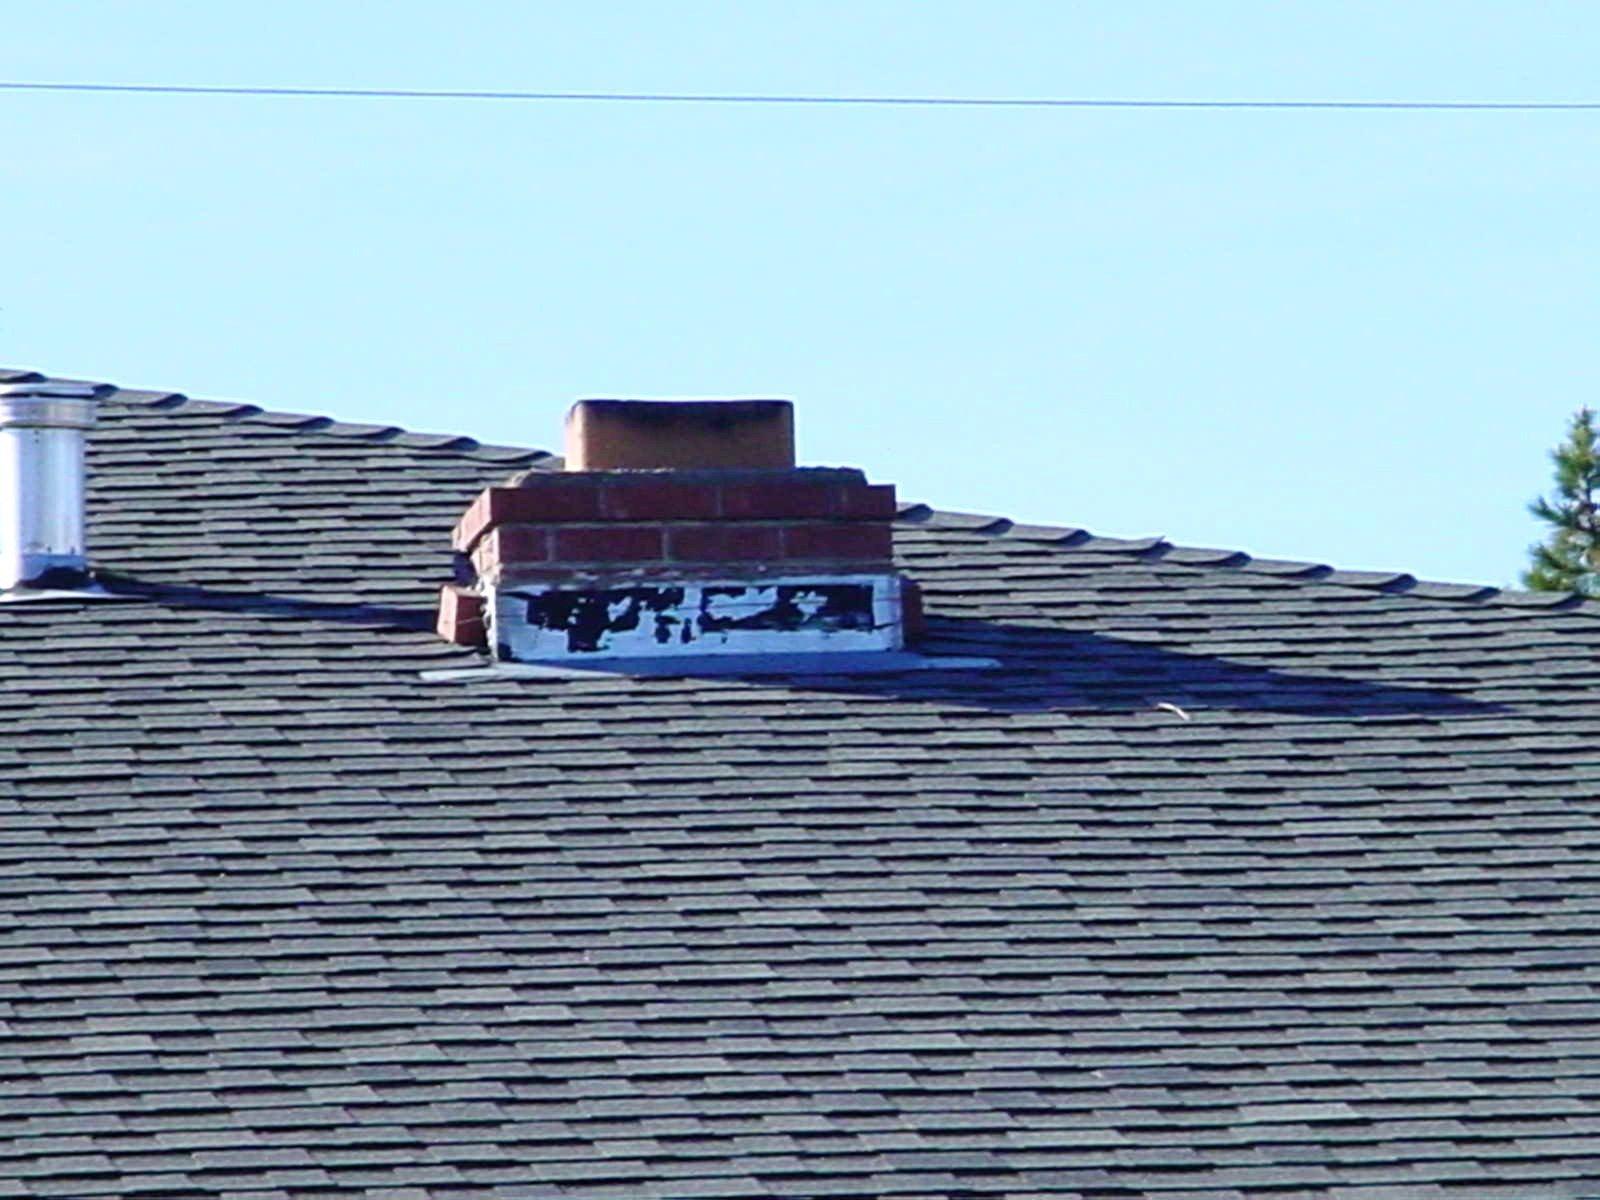 Chimney height is short of chimney penetration.